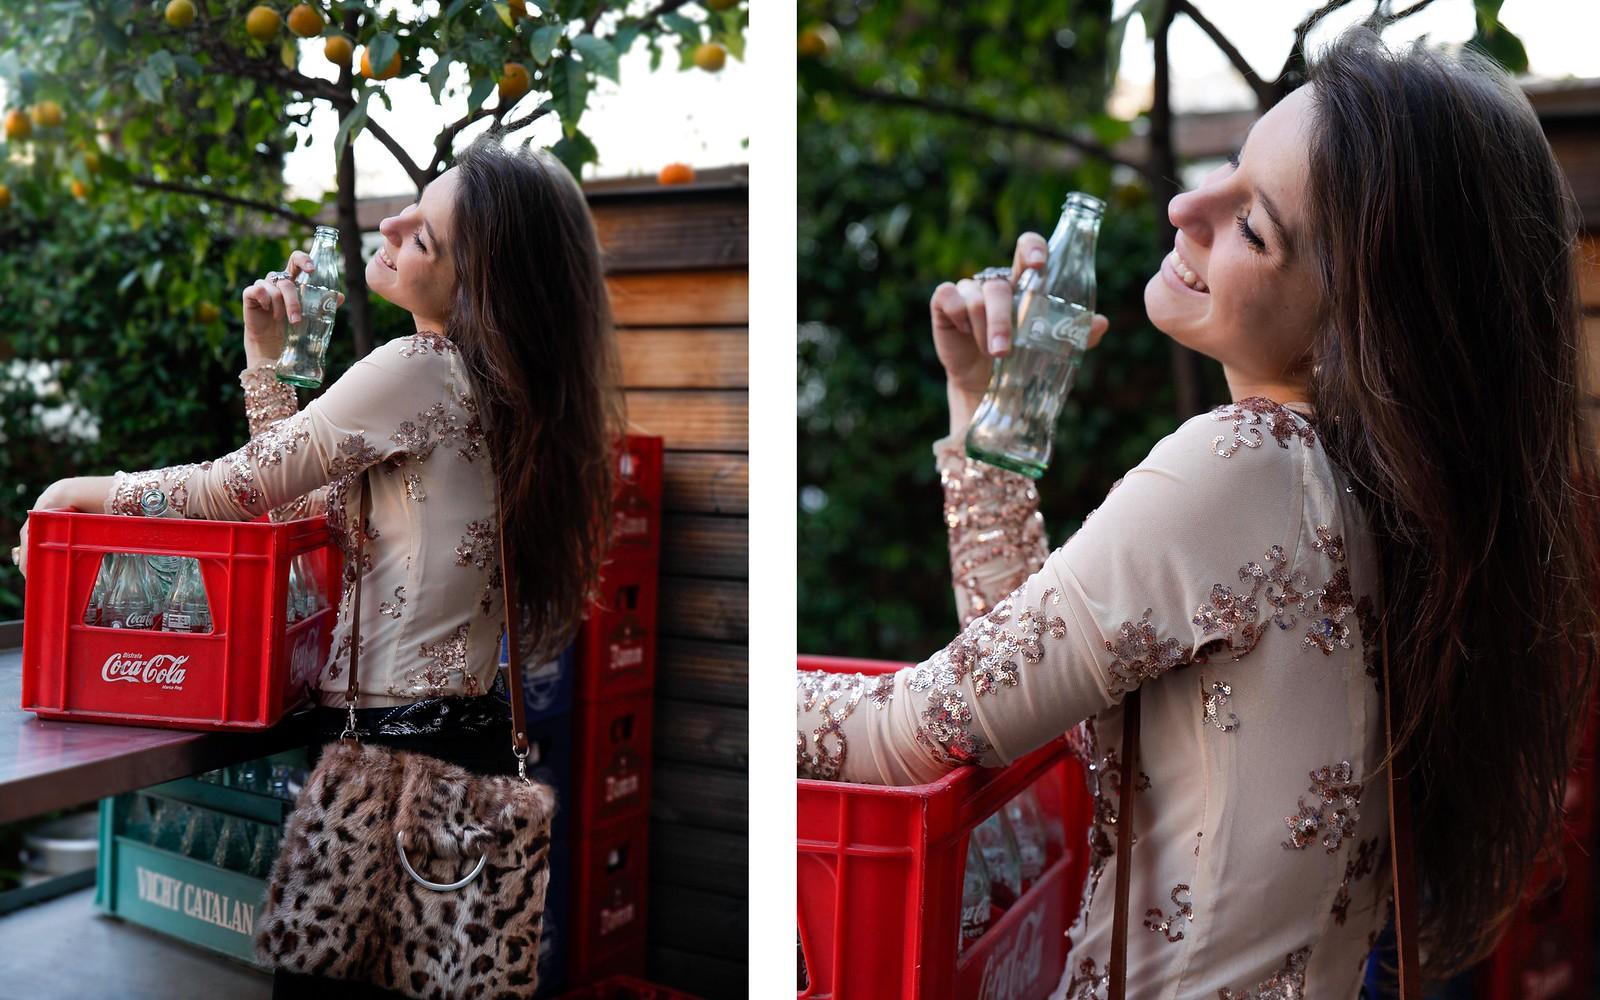 08_Sequins_Body_Nihgt_outfit_Danity_Paris_theguestgirl_laura_santolaria